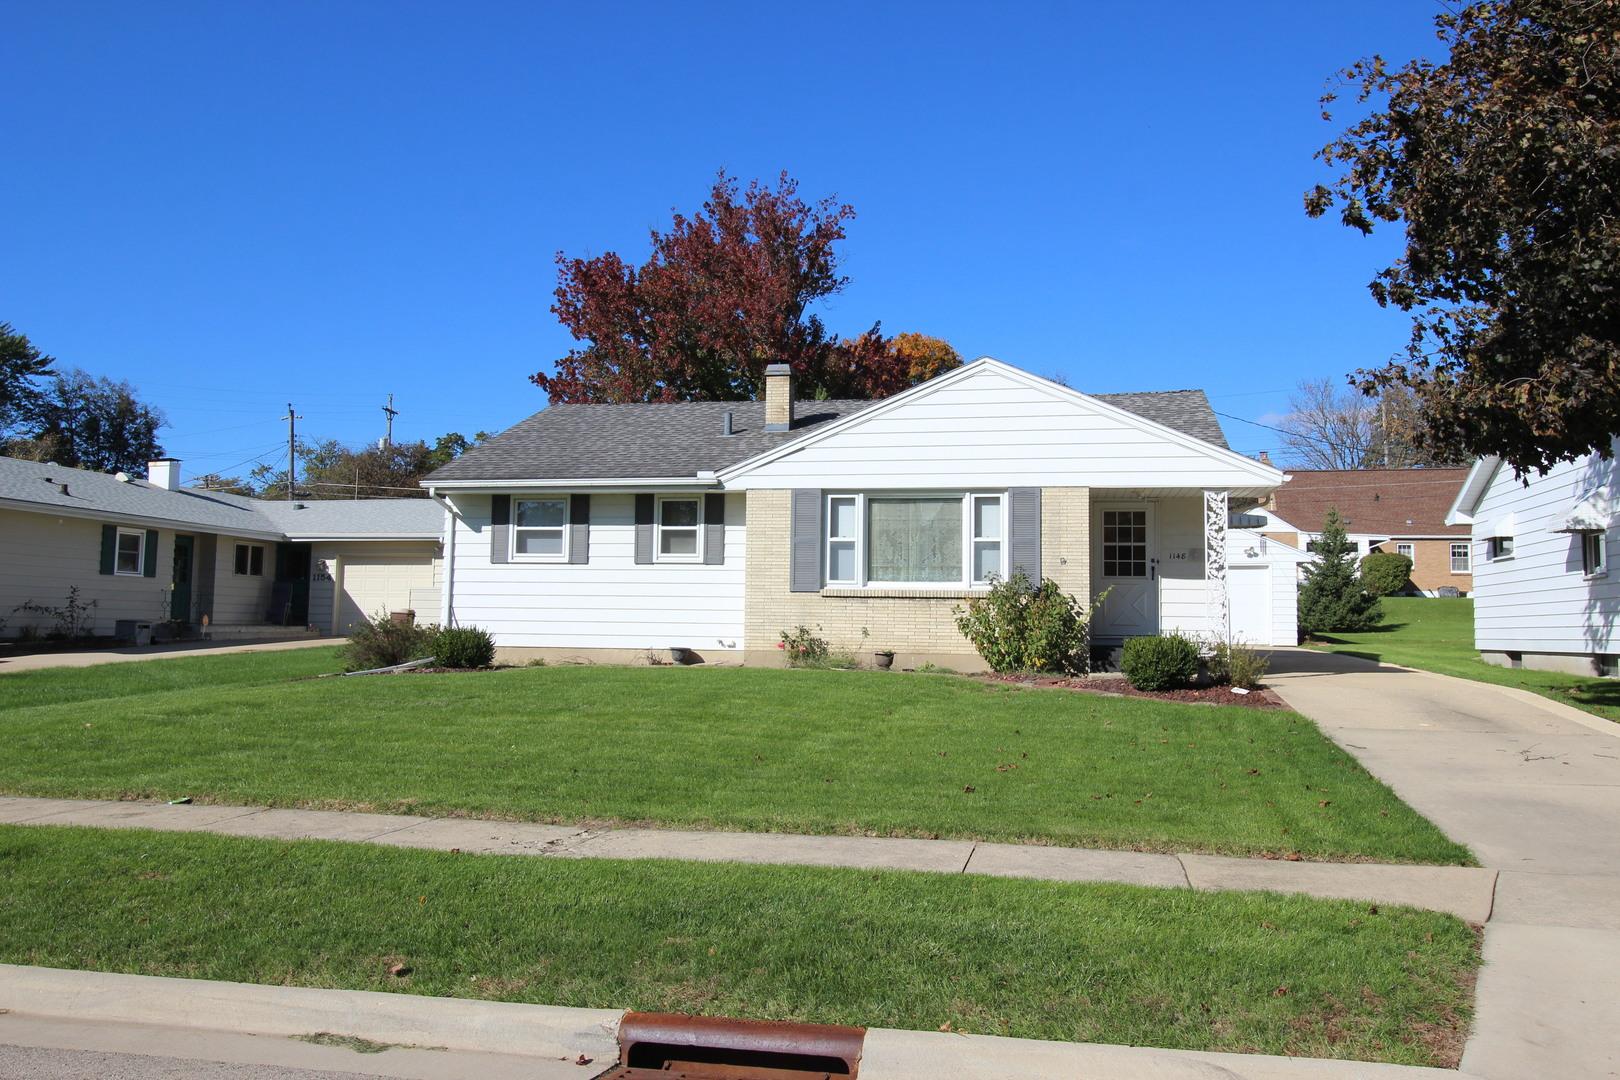 1148 Logan ,Freeport, Illinois 61032